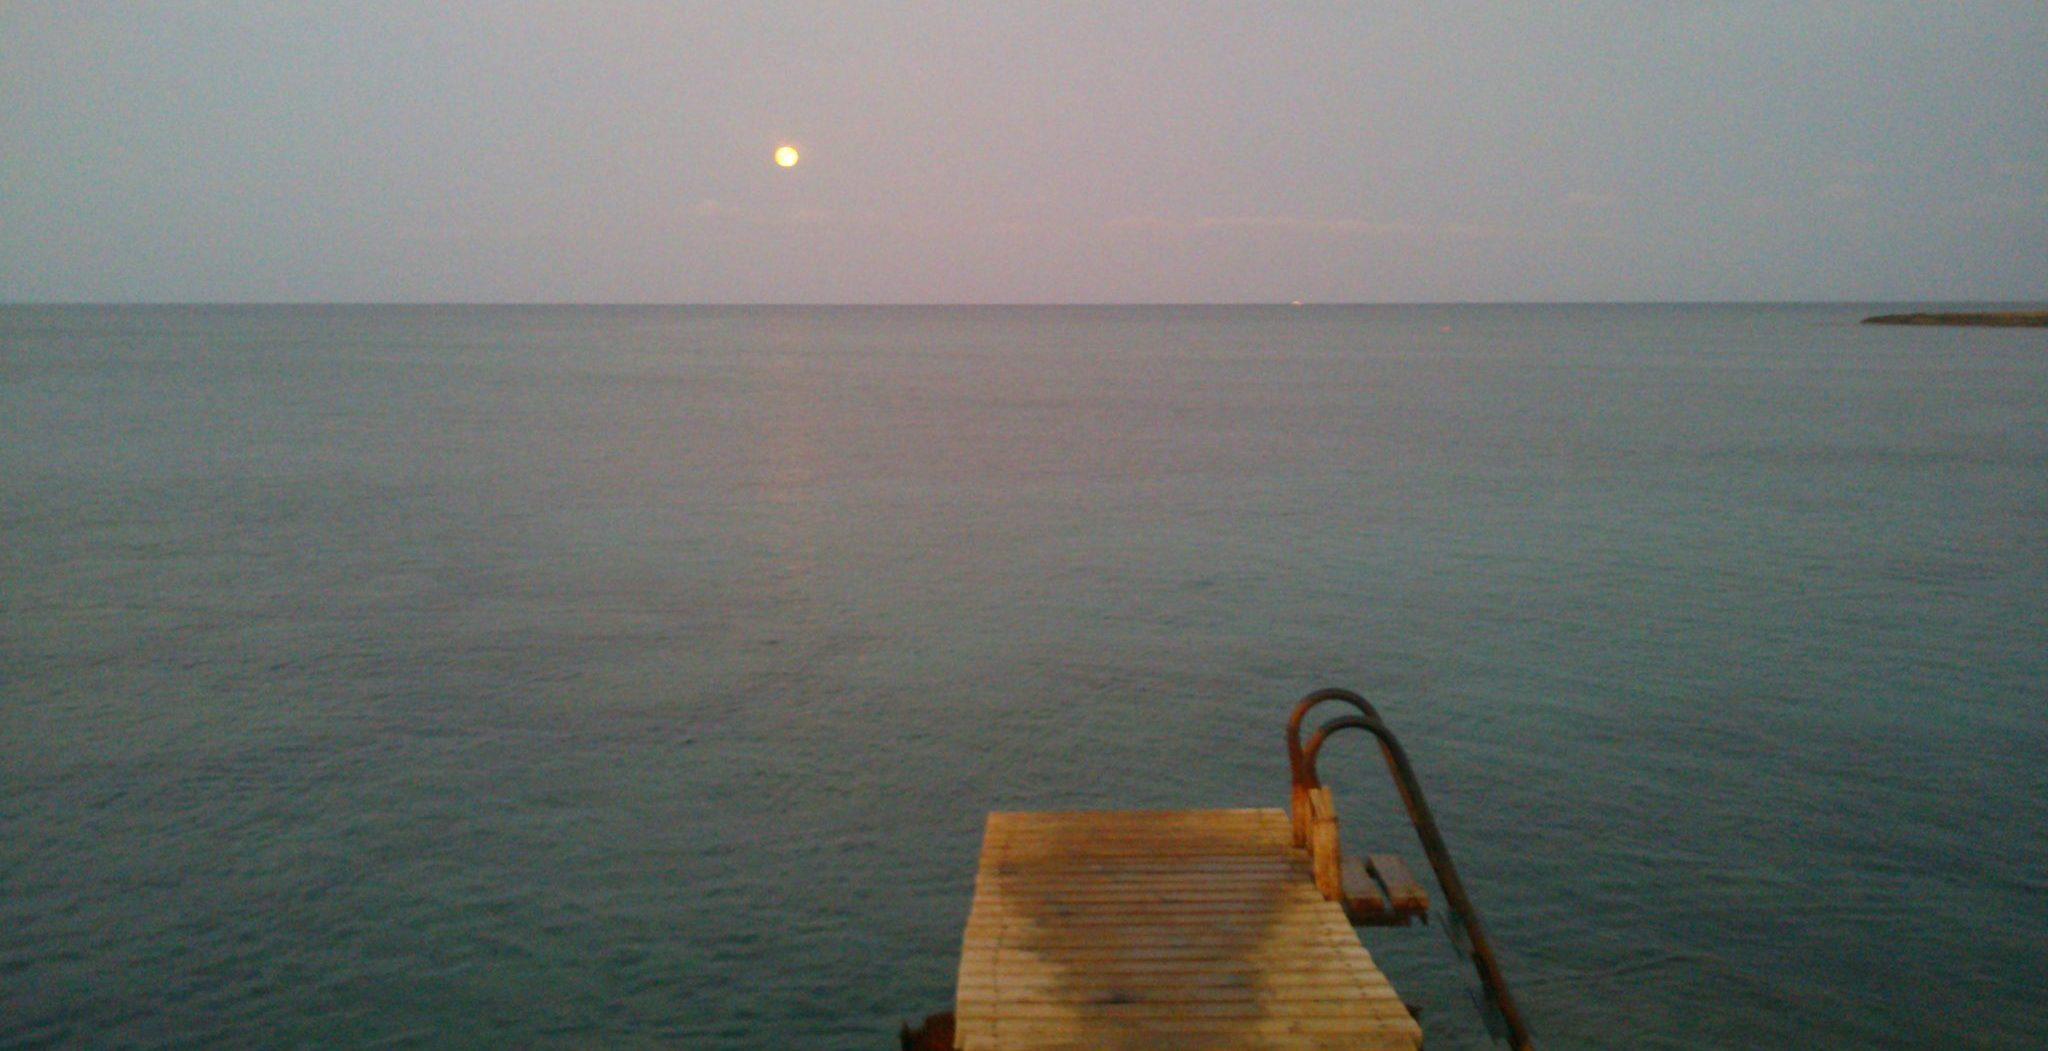 Bonita puesta de sol meditarránea